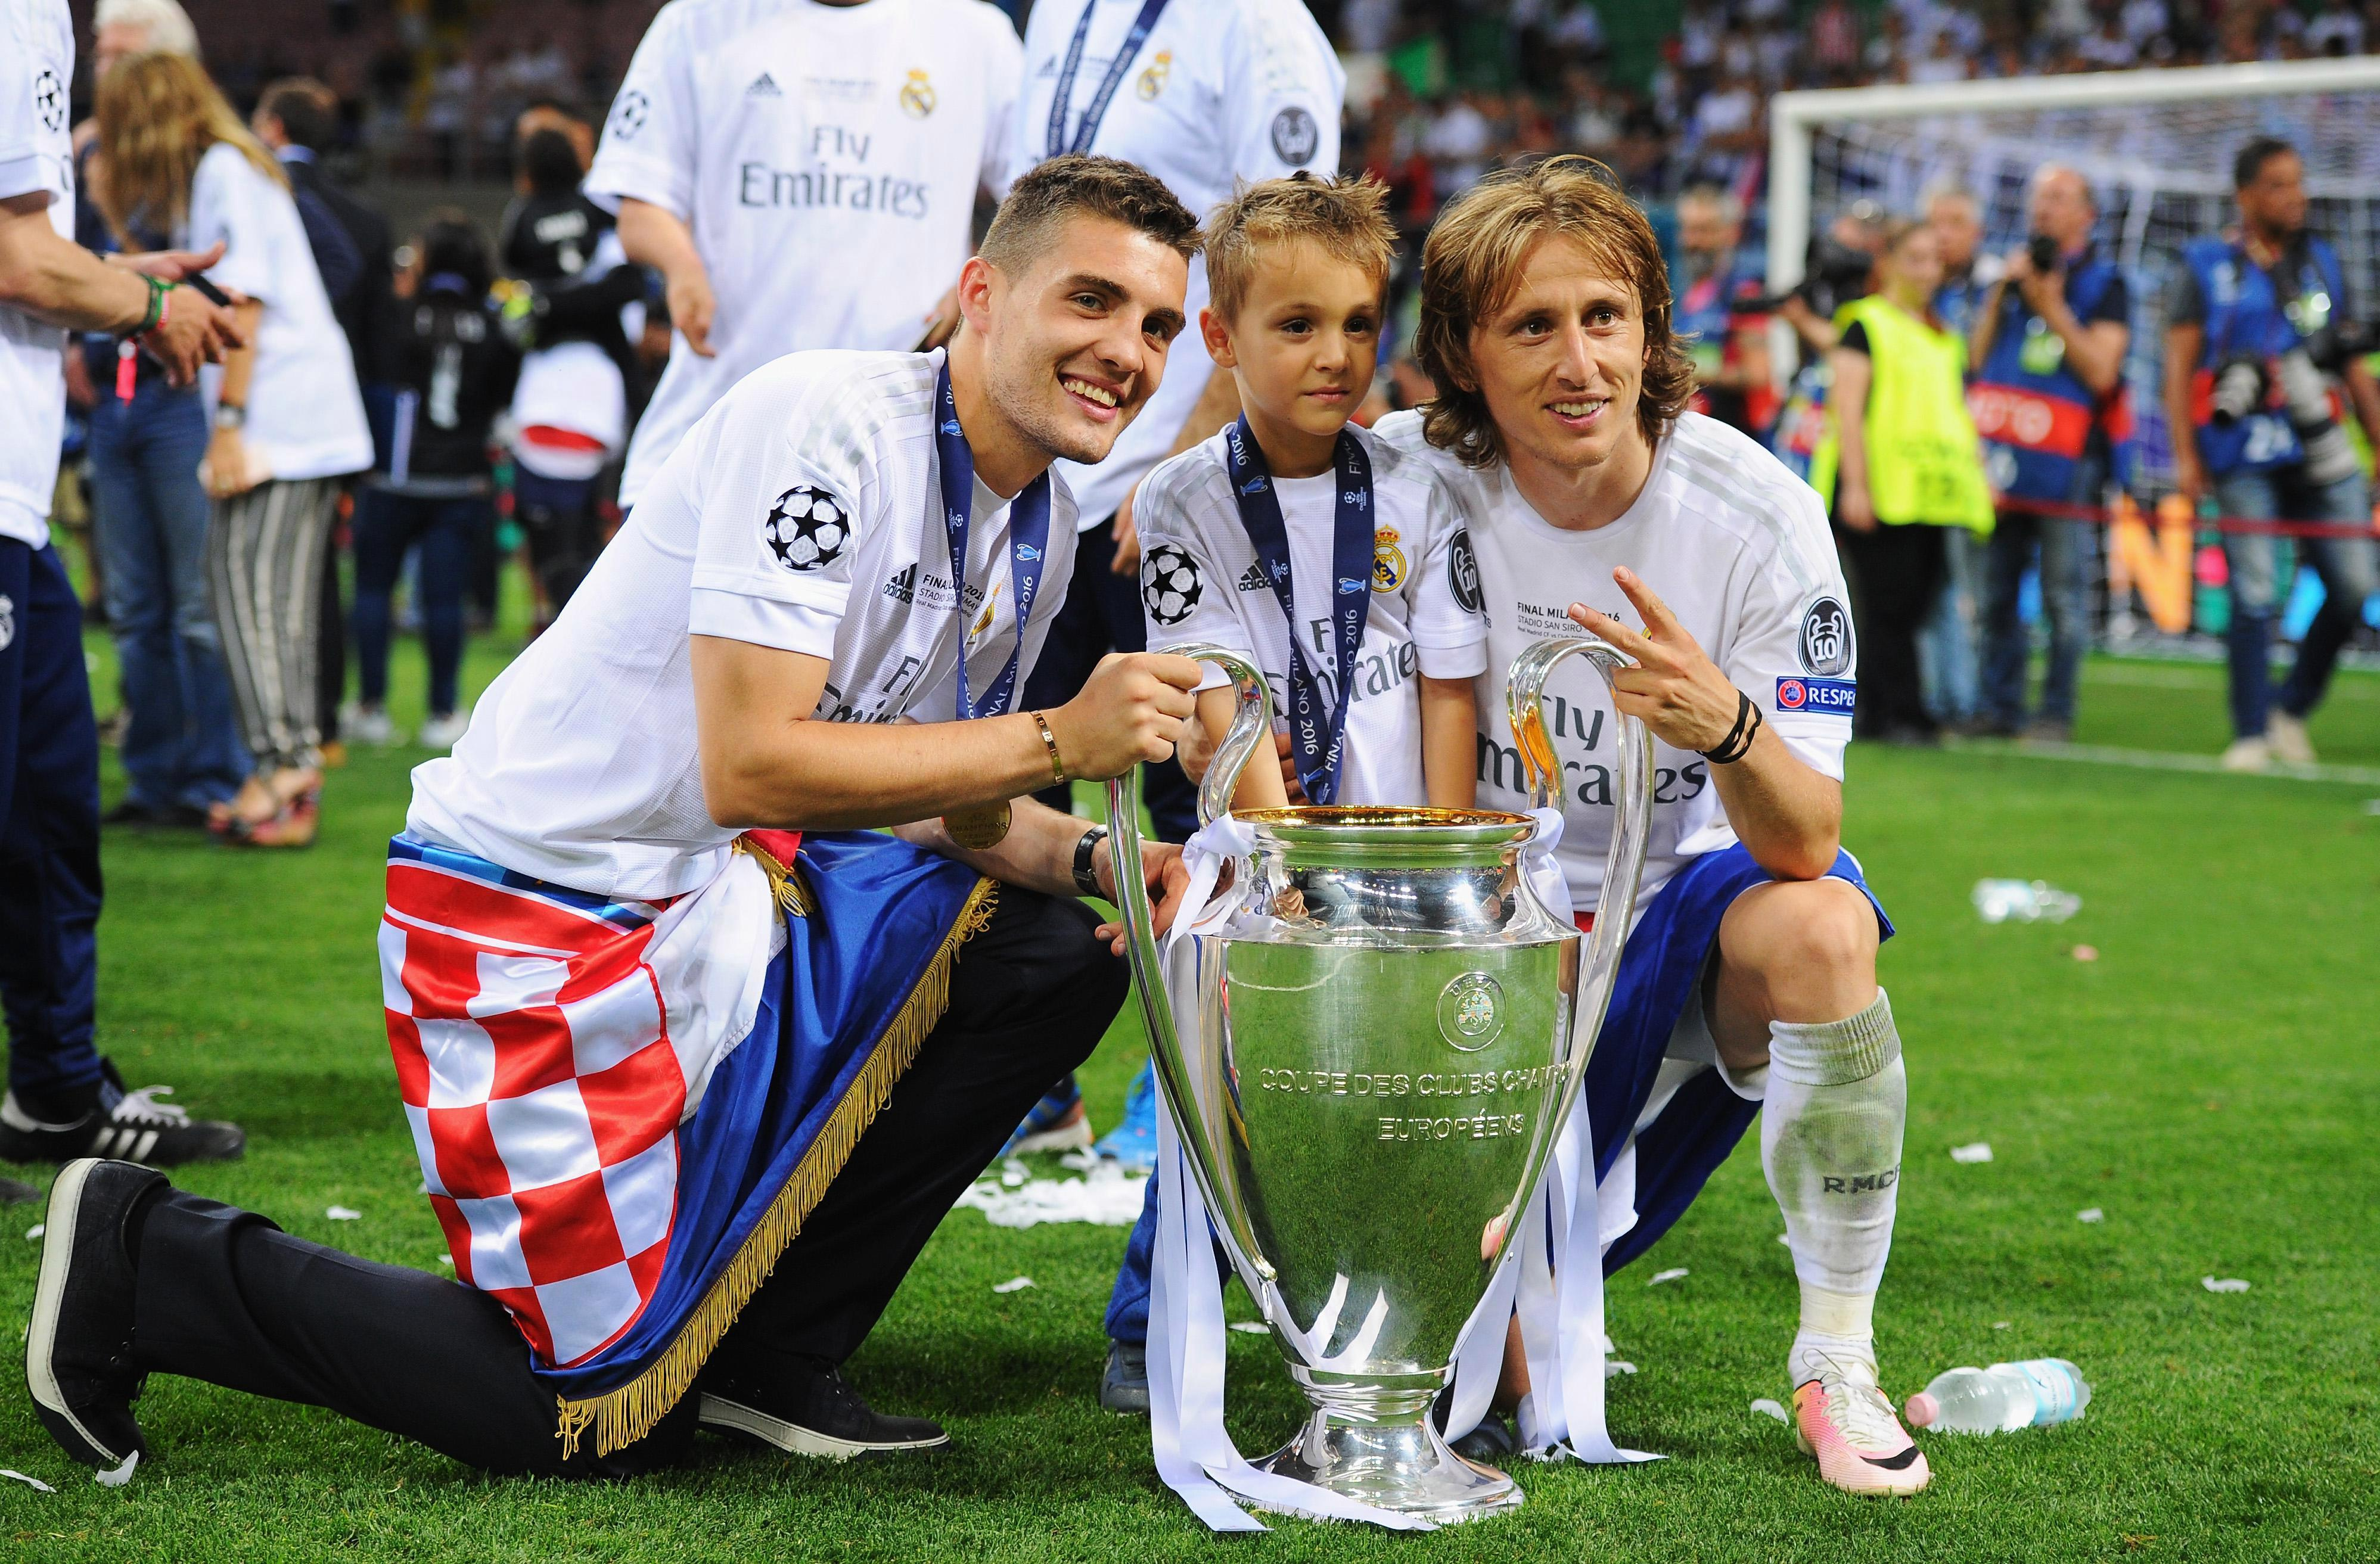 Croatia internationals Mateo Kovacic and Luka Modric with Champions League